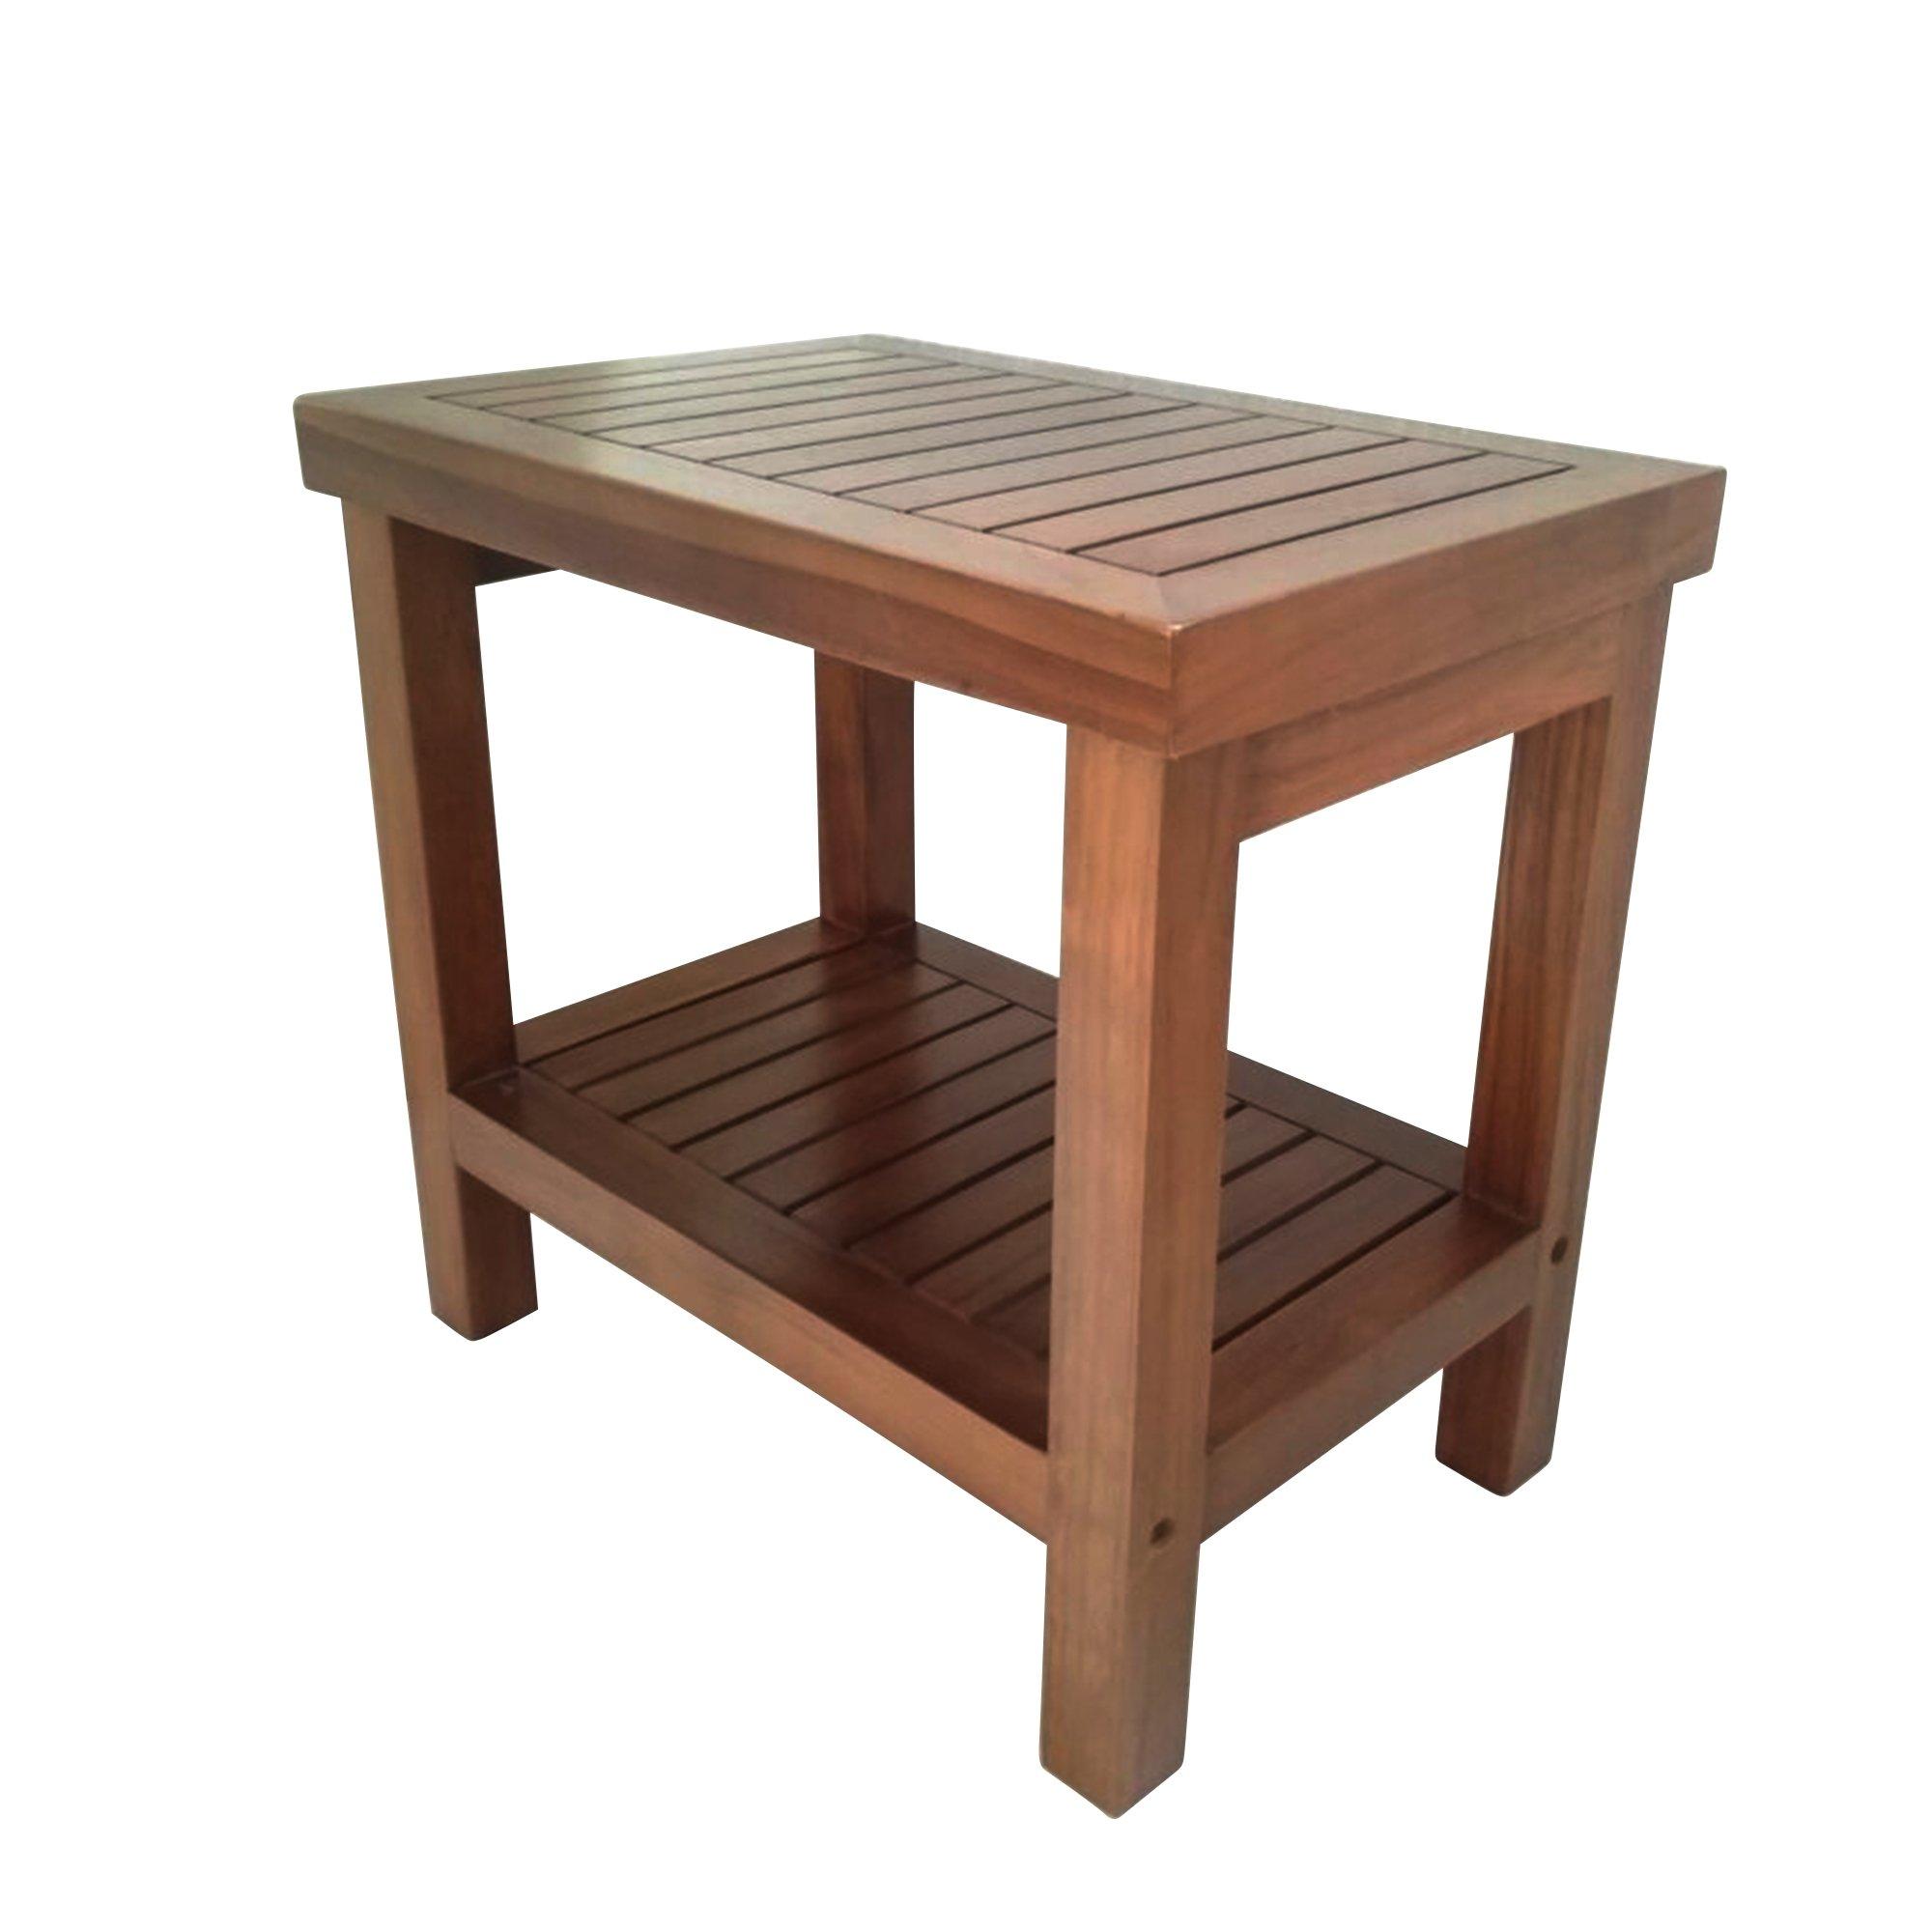 AlaTeak Wood Shower Bath Spa Waterproof Stool Bench with Shelf 19''